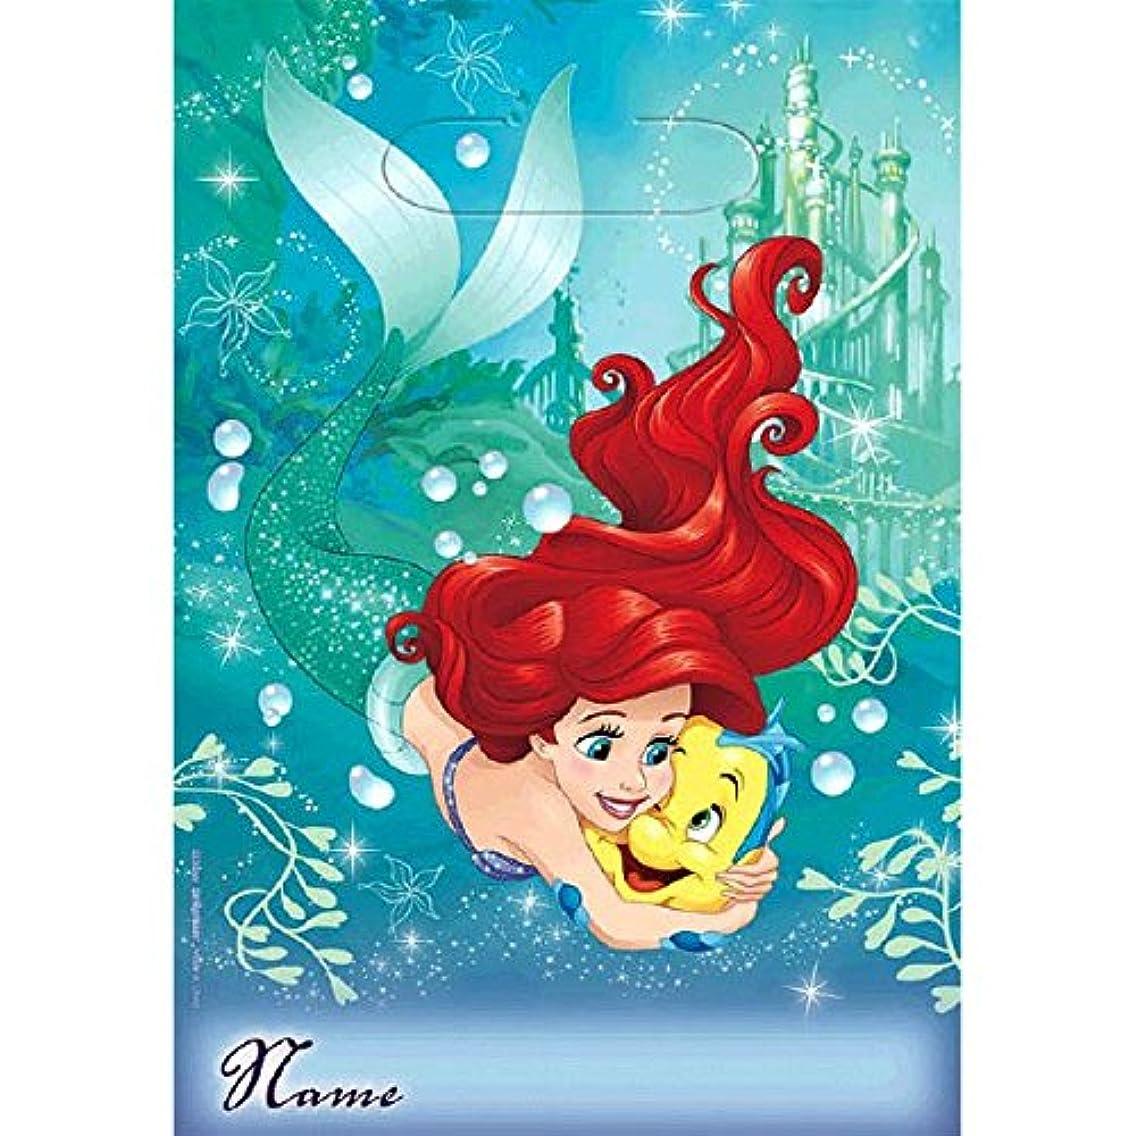 American Greetings Disney Ariel The Little Mermaid Party Supplies Plastic Treat Bags, 8-Count